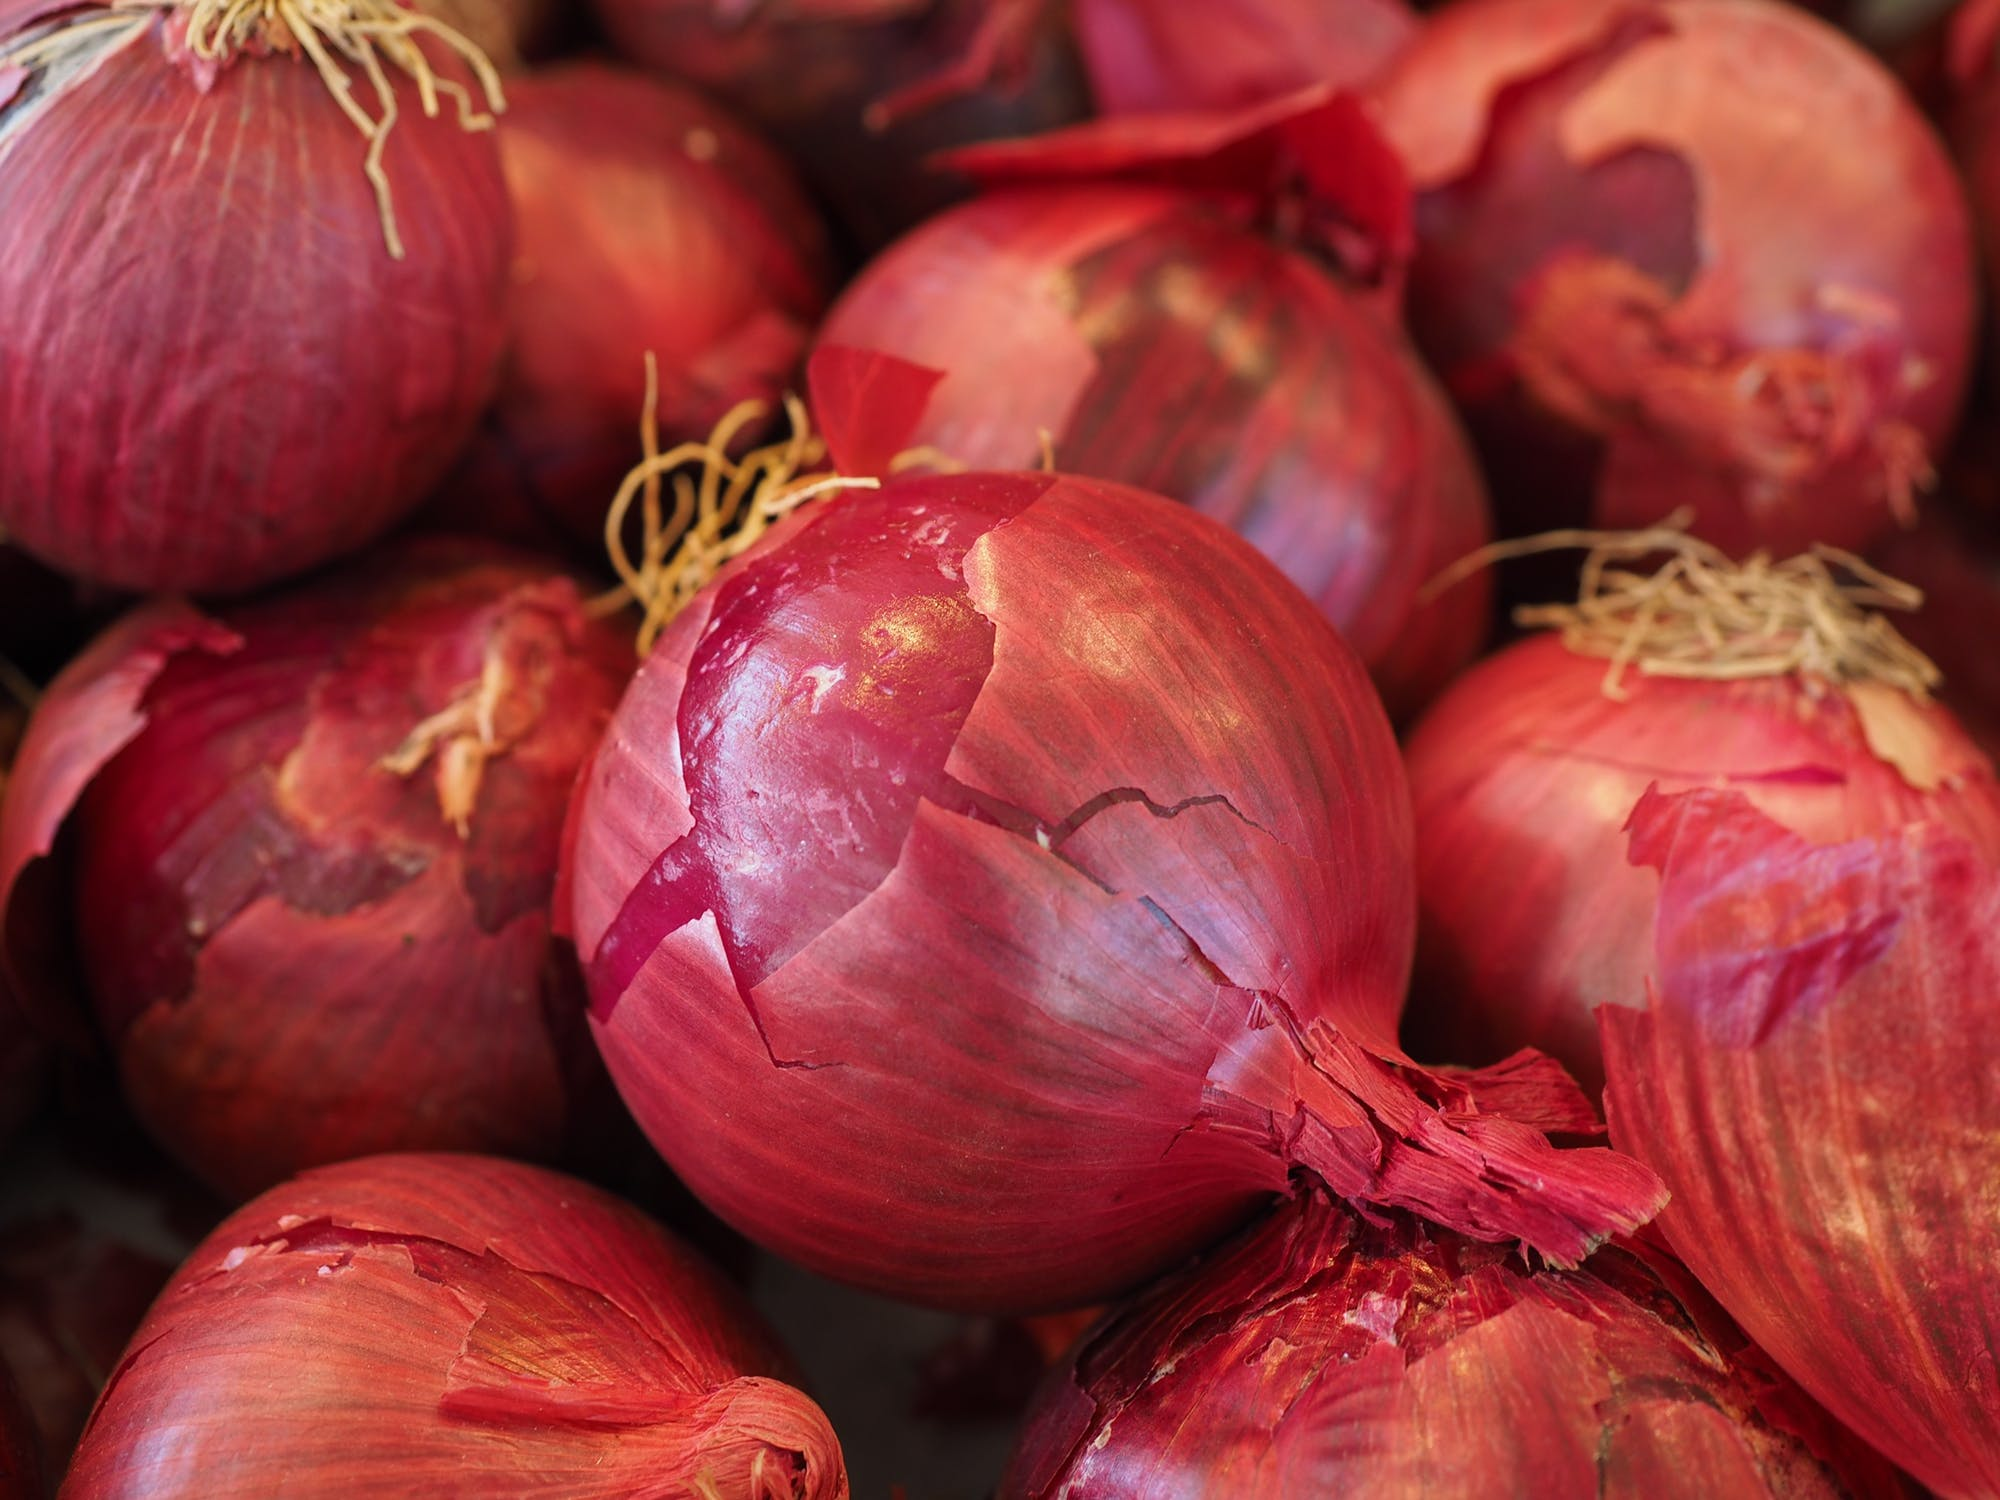 red-onions-vegetables-vegetable-onion-onion-market-47051.jpg